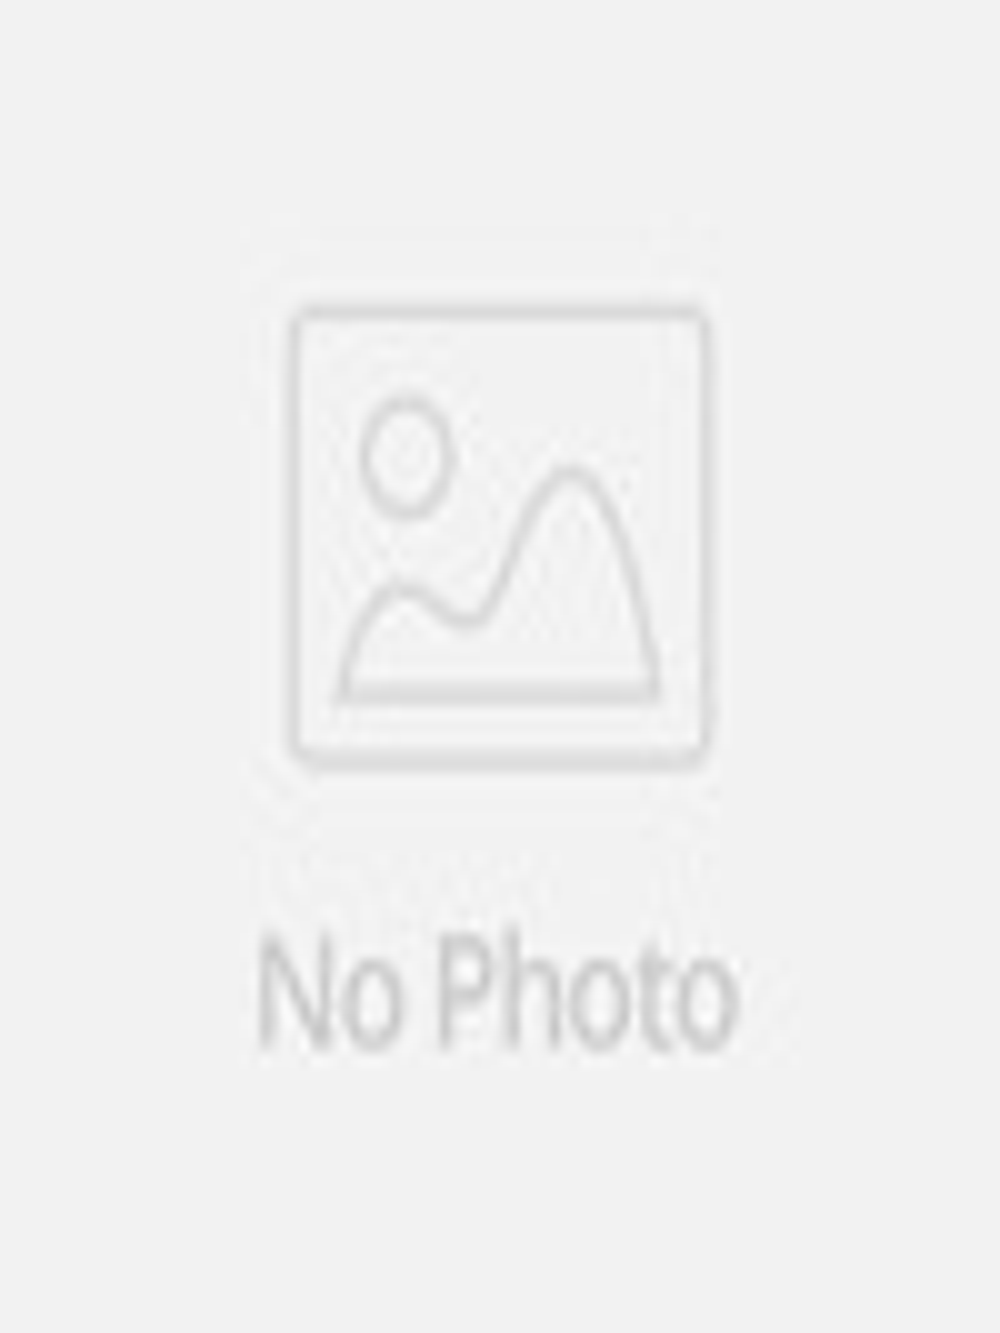 lace high neck princess cut wedding dress with sheer allure hswdh sheer top wedding dress